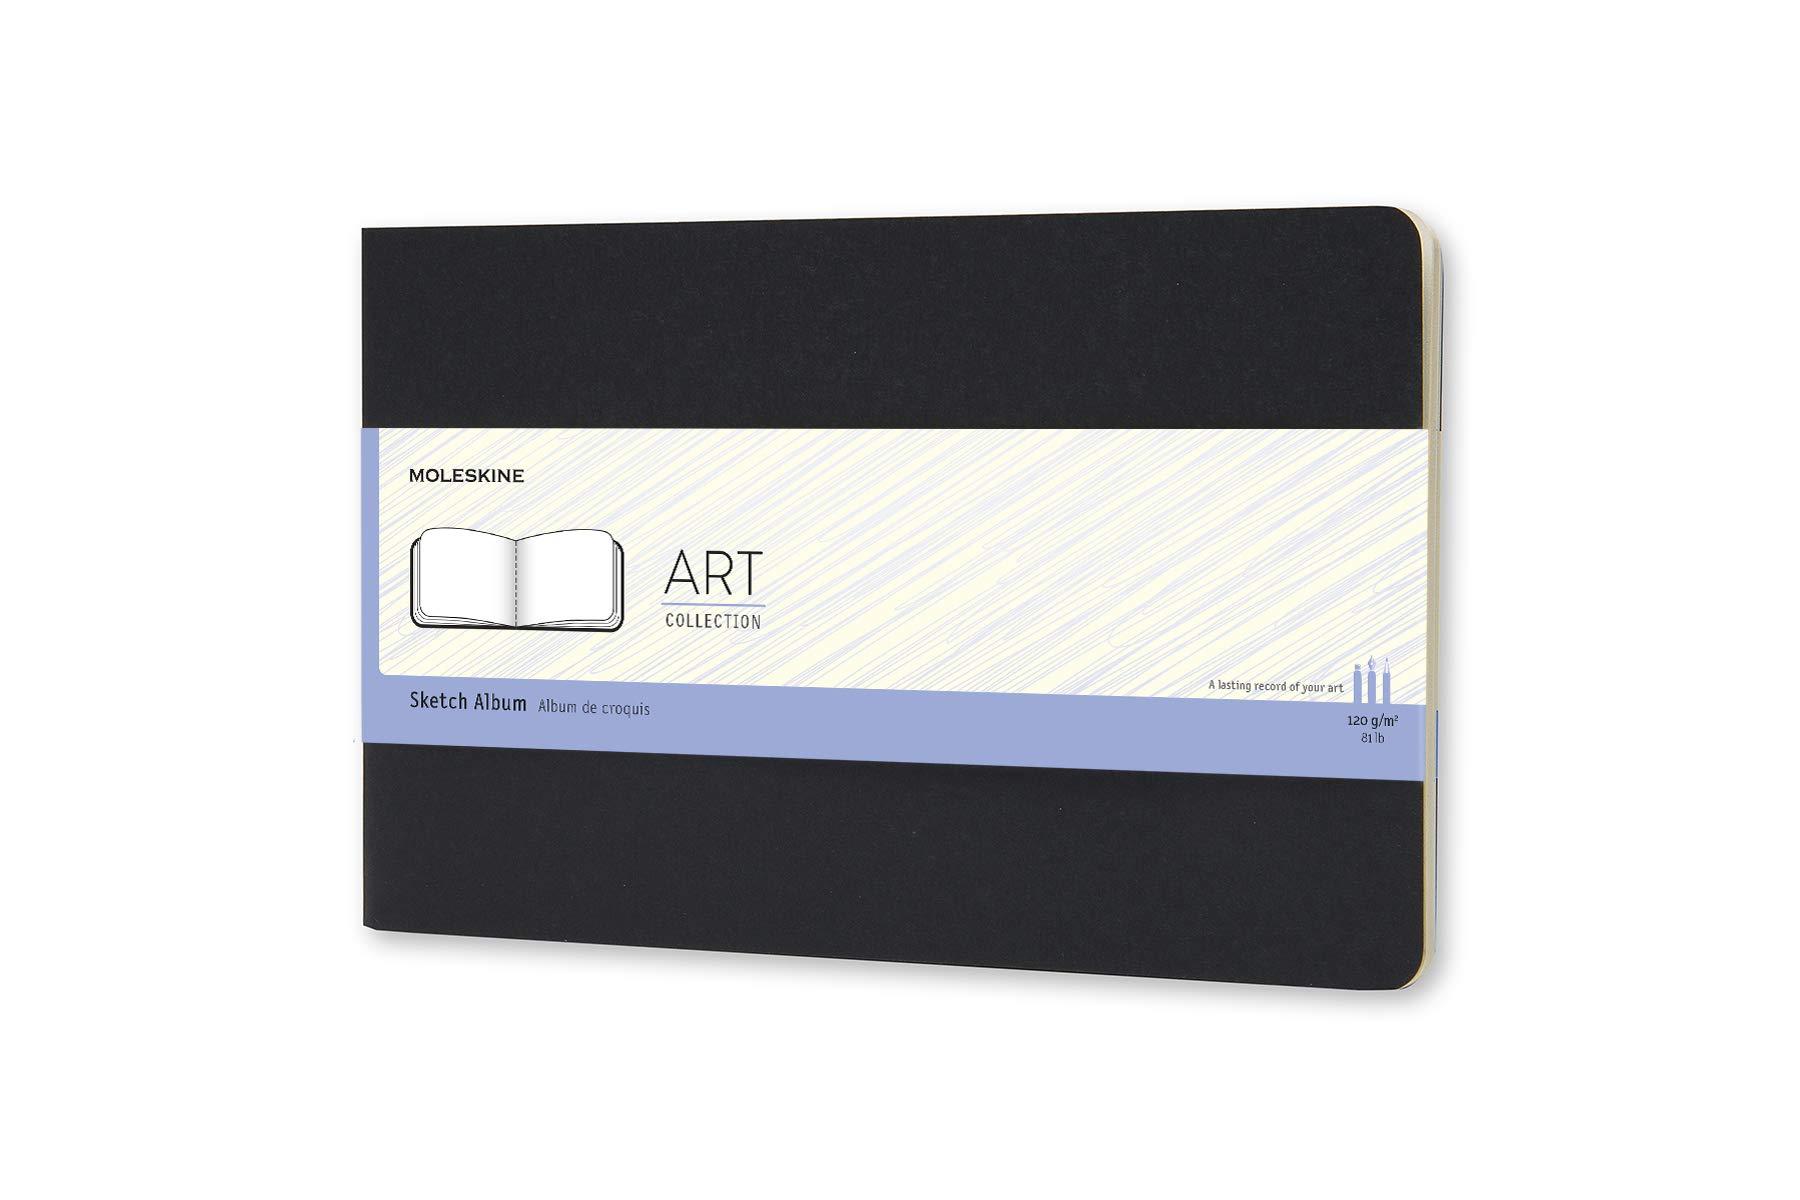 Moleskine Art Plus Hard Cover Sketch Album, Plain, Large (5.